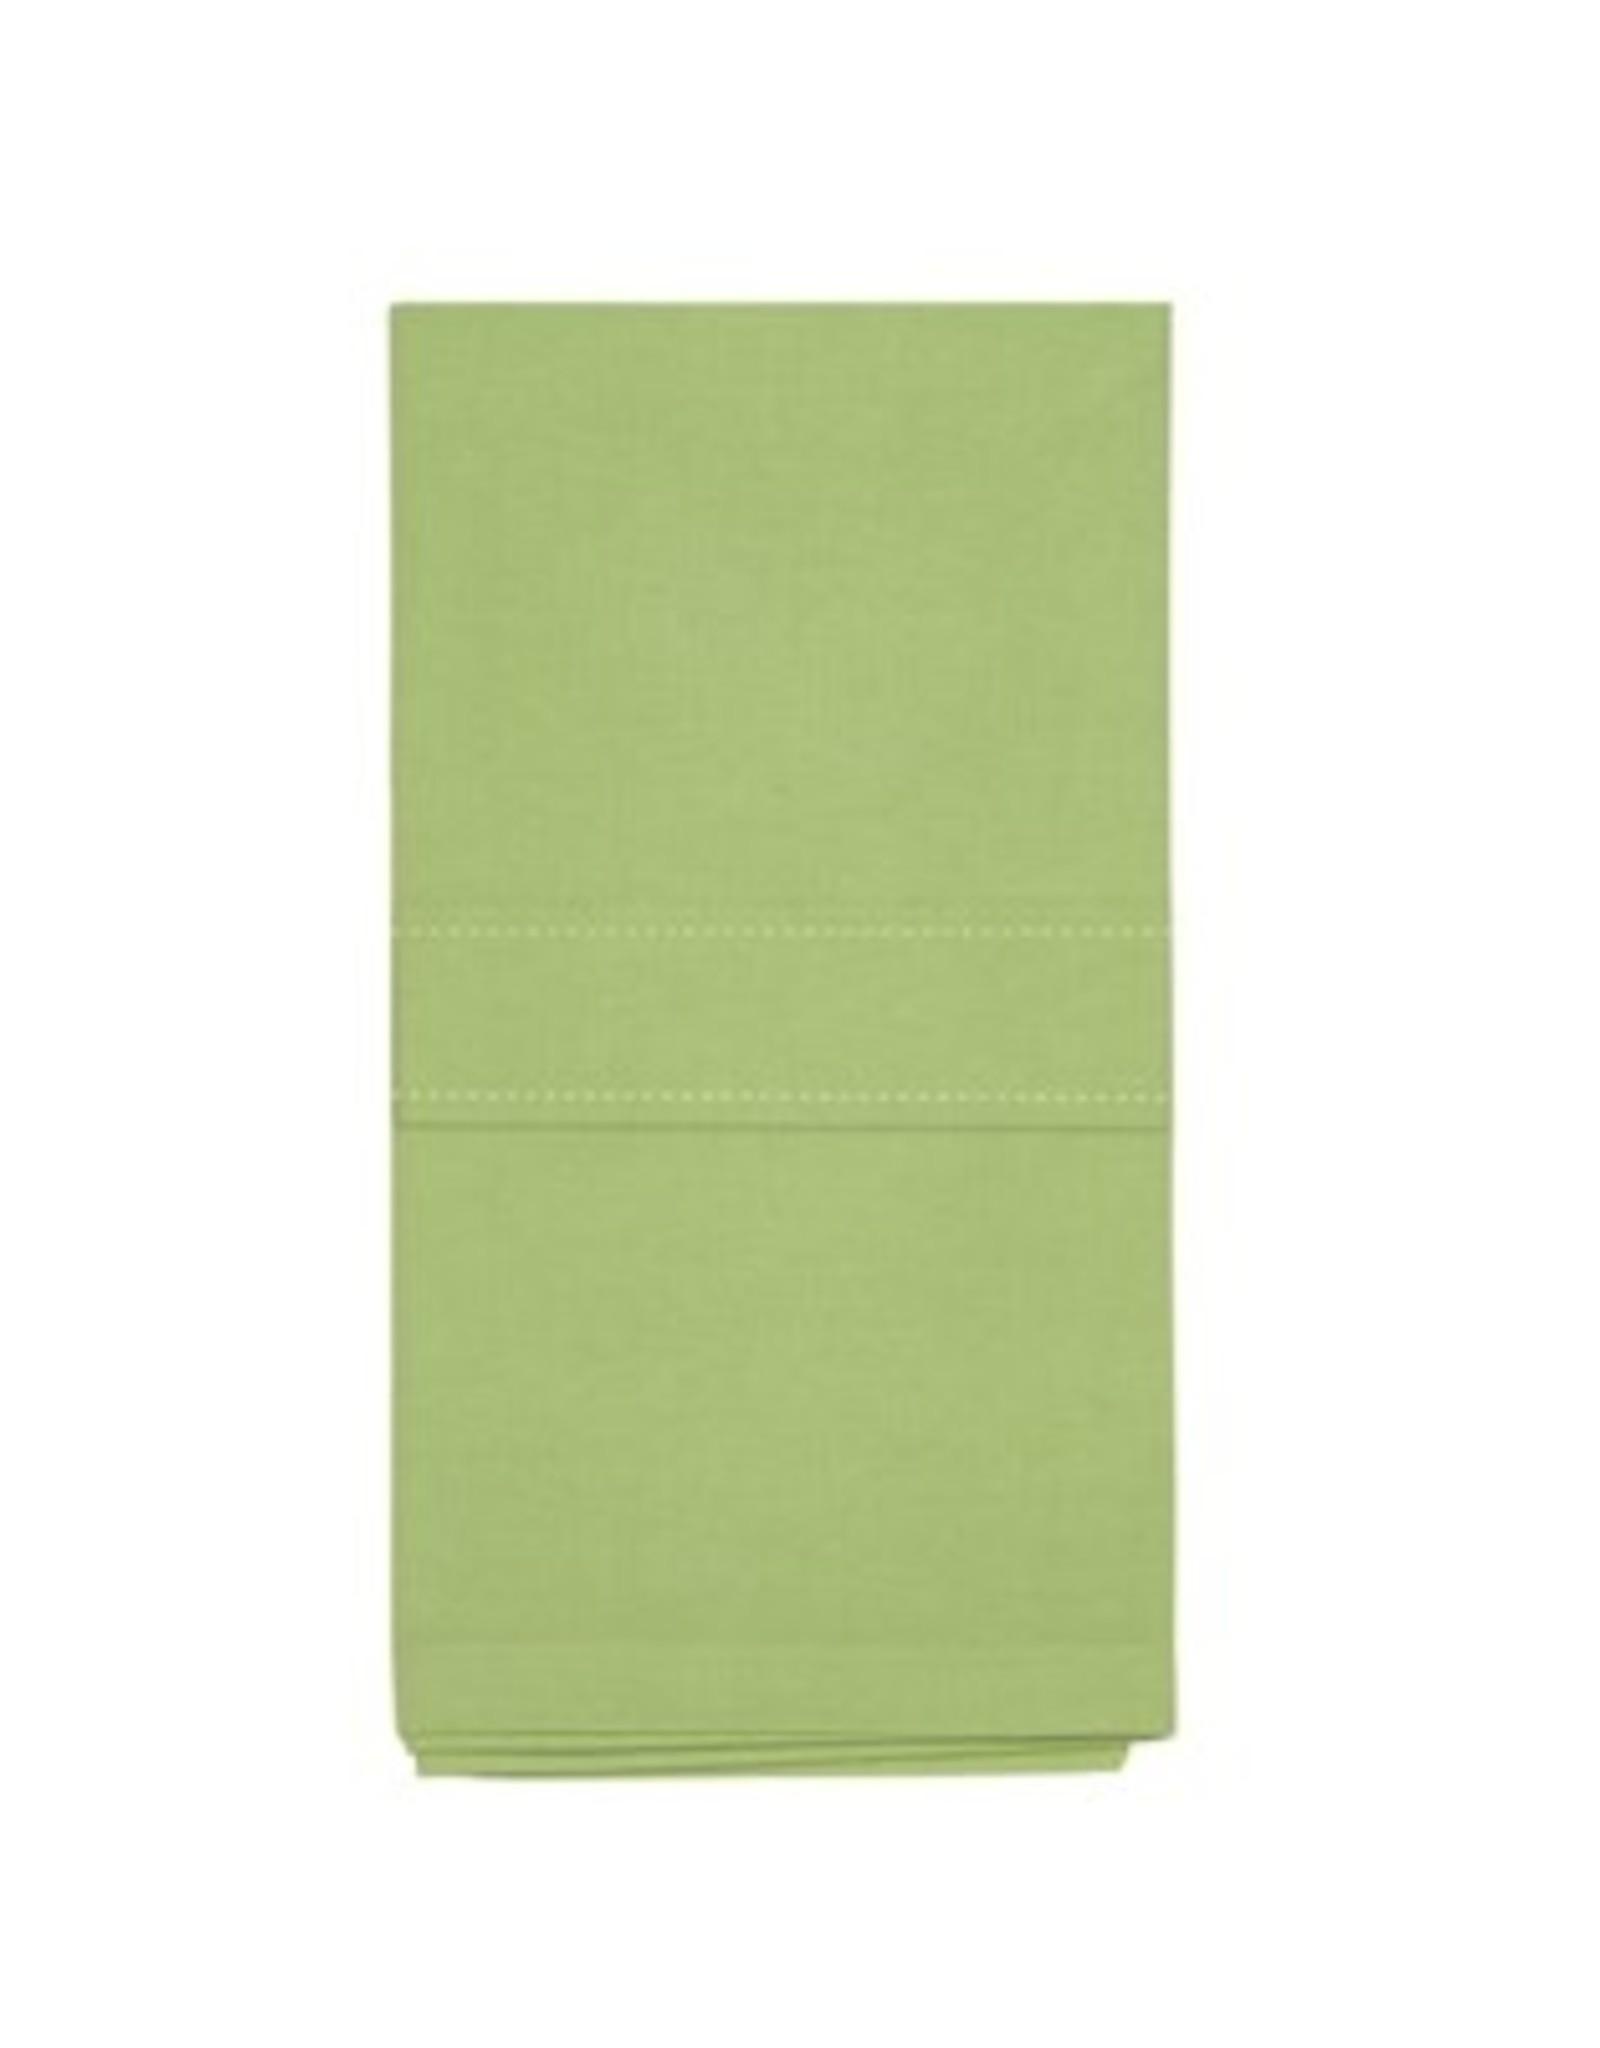 Napkins Harman Stock Solid Set of 4 Green